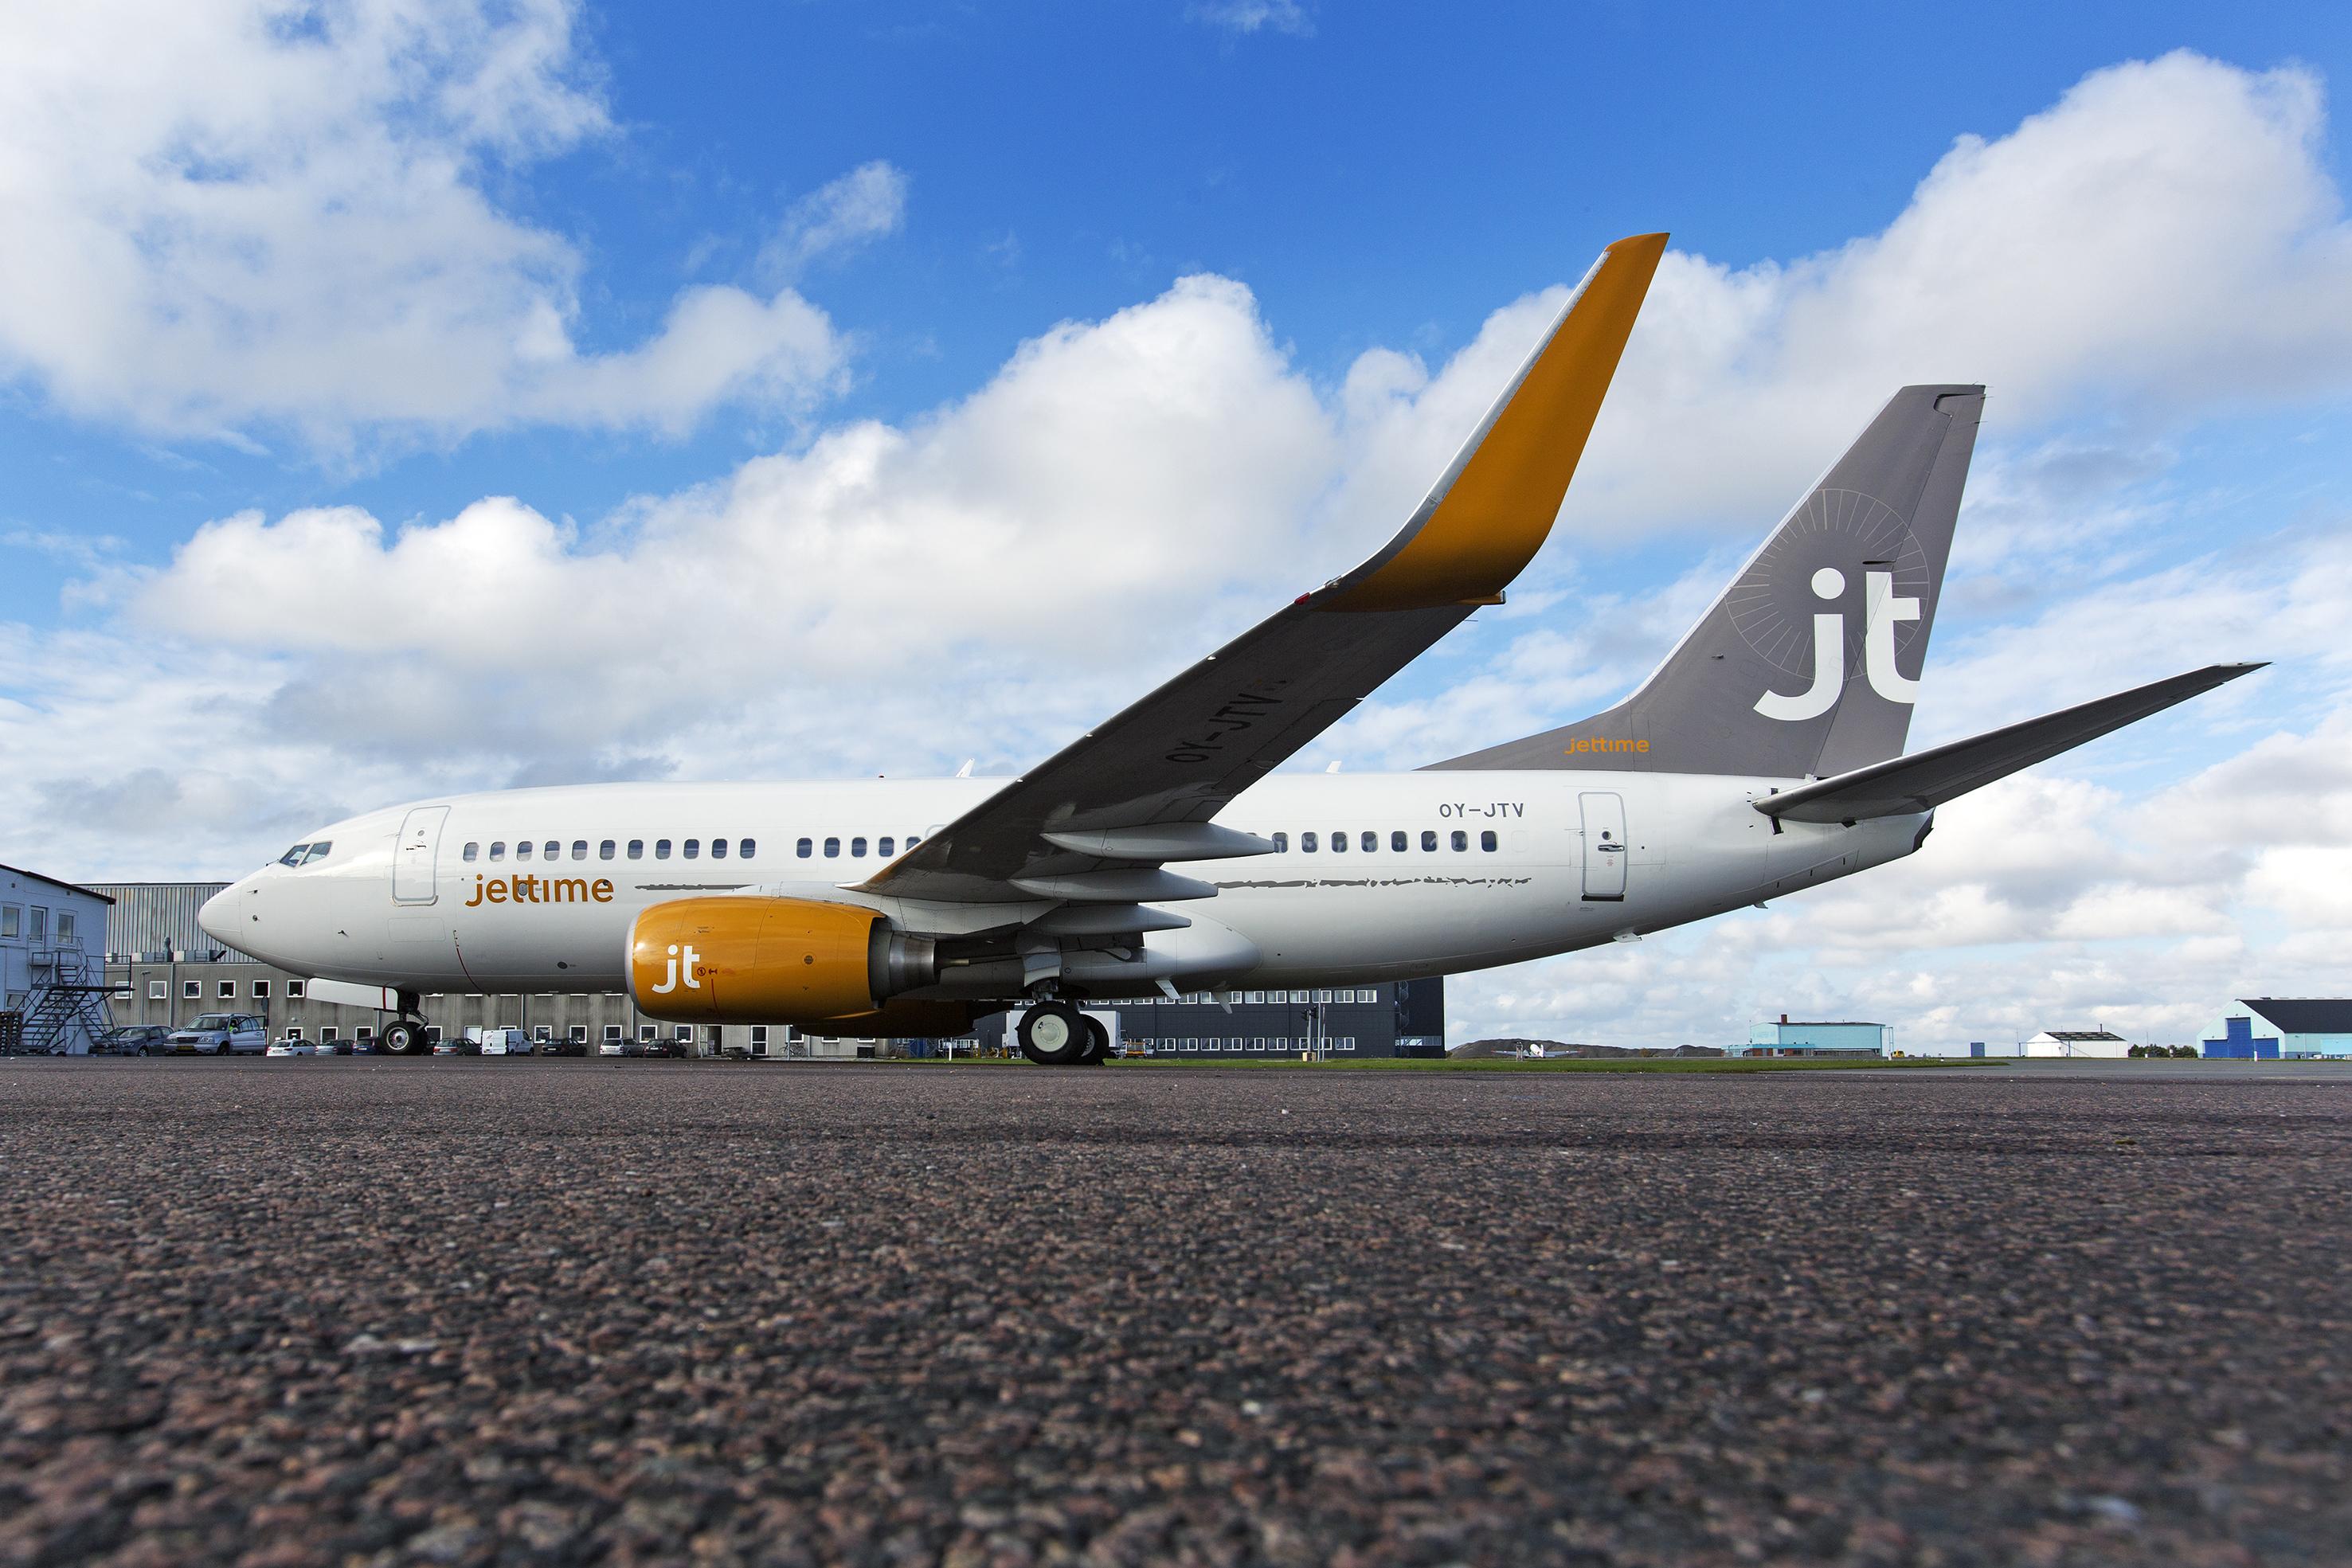 Jet Time Boeing 737 (Foto: Thorkild Jensen)